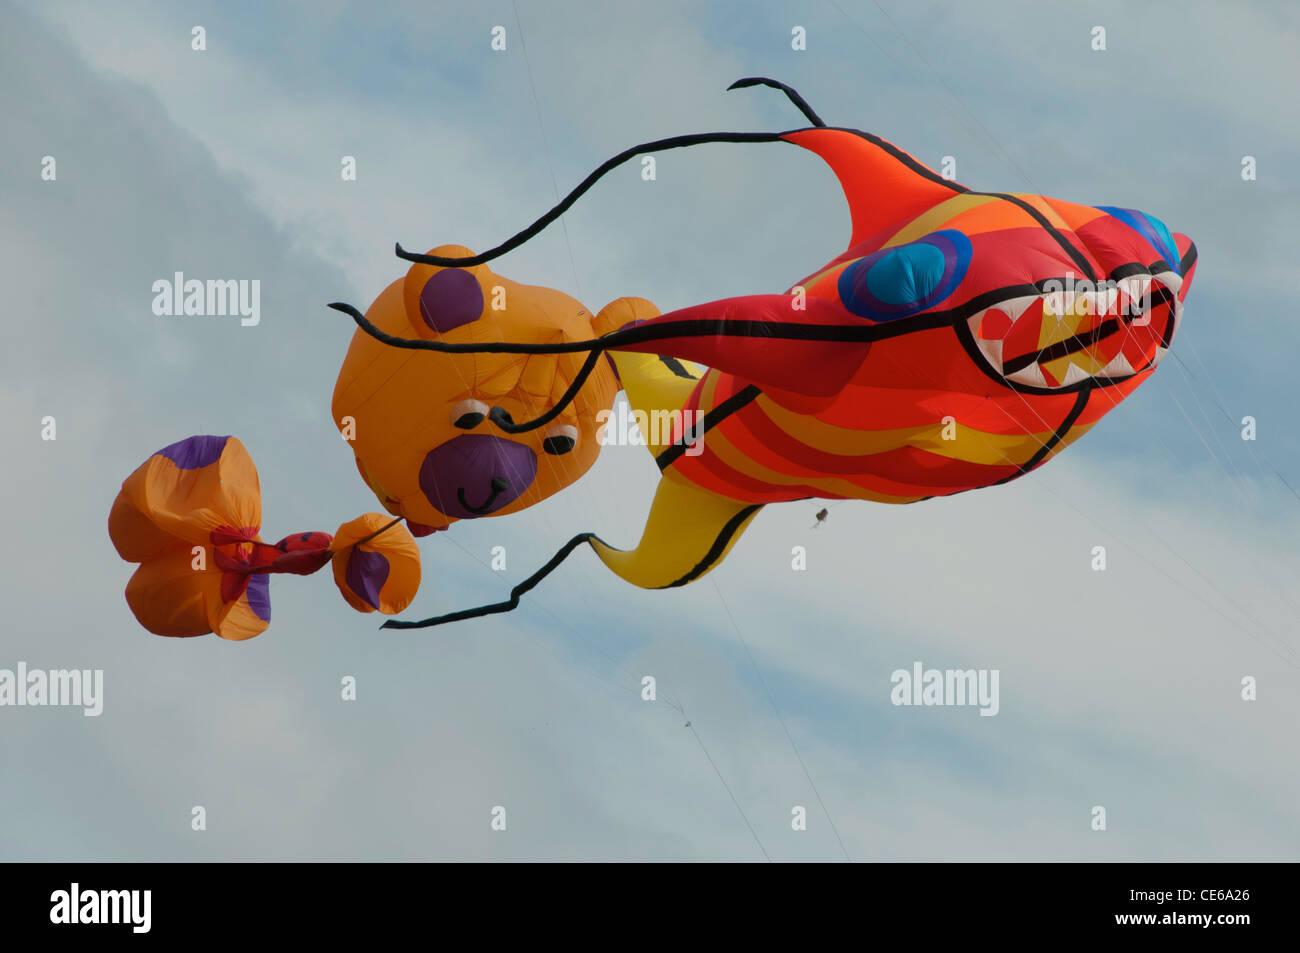 Kites - Stock Image